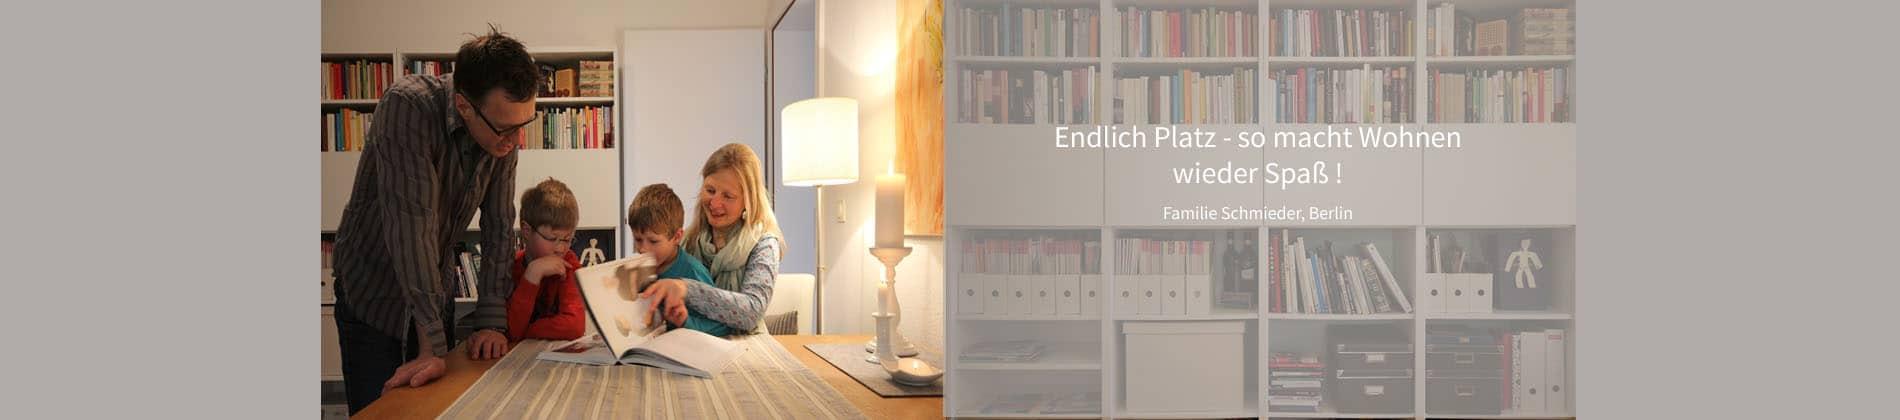 Testimonial Jürgen - Innenarchitekturbüro - Innenarchitekt in Berlin. Raum | Plan. Carola Baumgarten